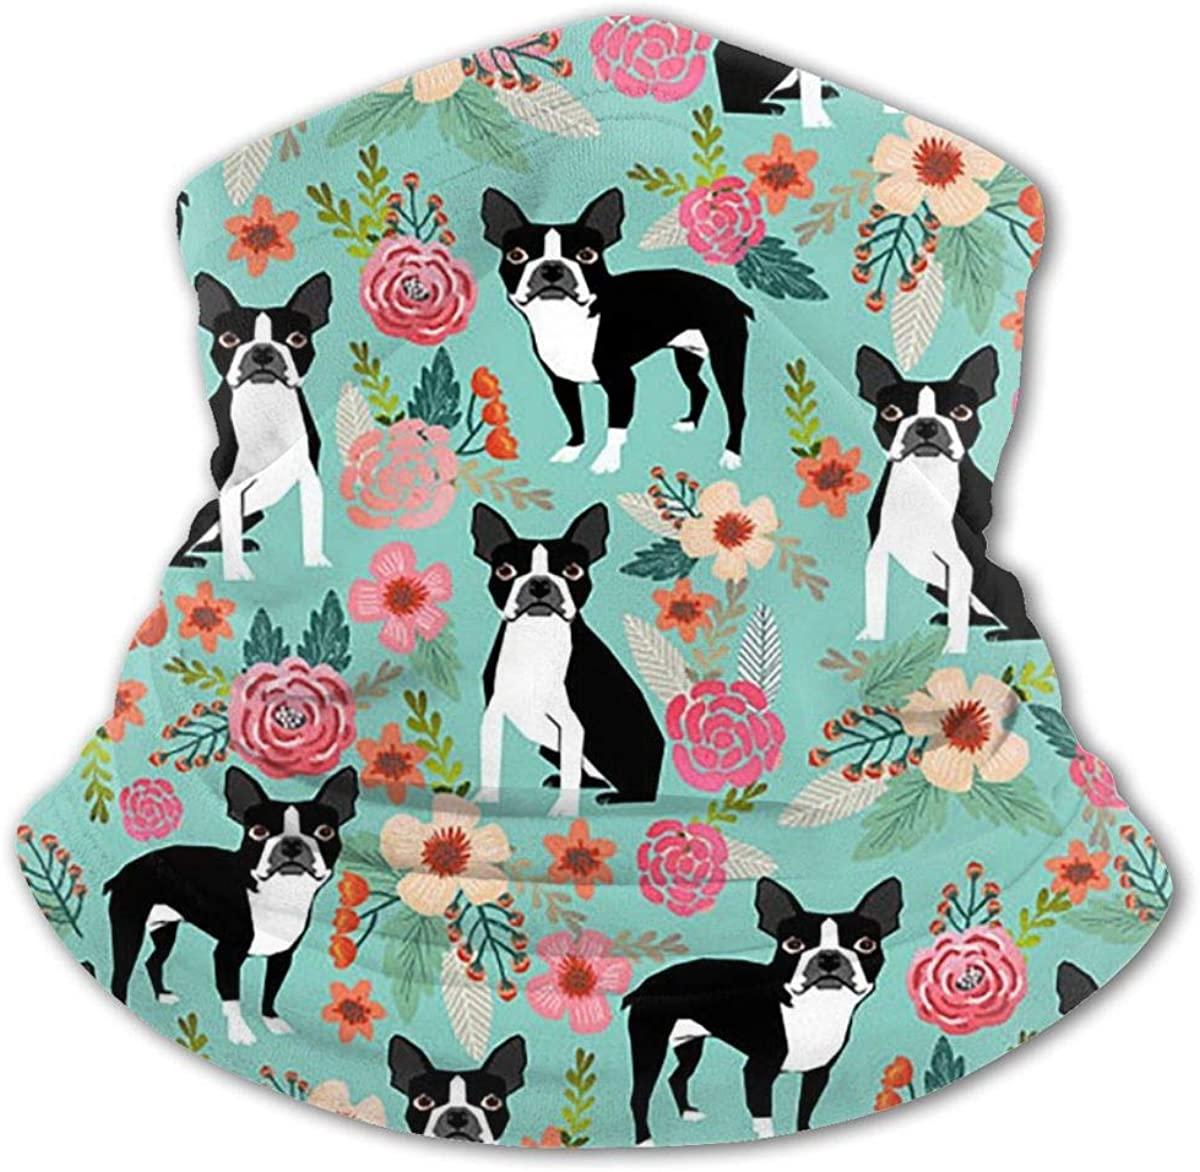 Boston Terrier Headwear For Girls And Boys, Head Wrap, Neck Gaiter, Headband, Tenn Fishing Mask, Magic Scarf, Tube Mask, Face Bandana Mask For Camping Running Cycling